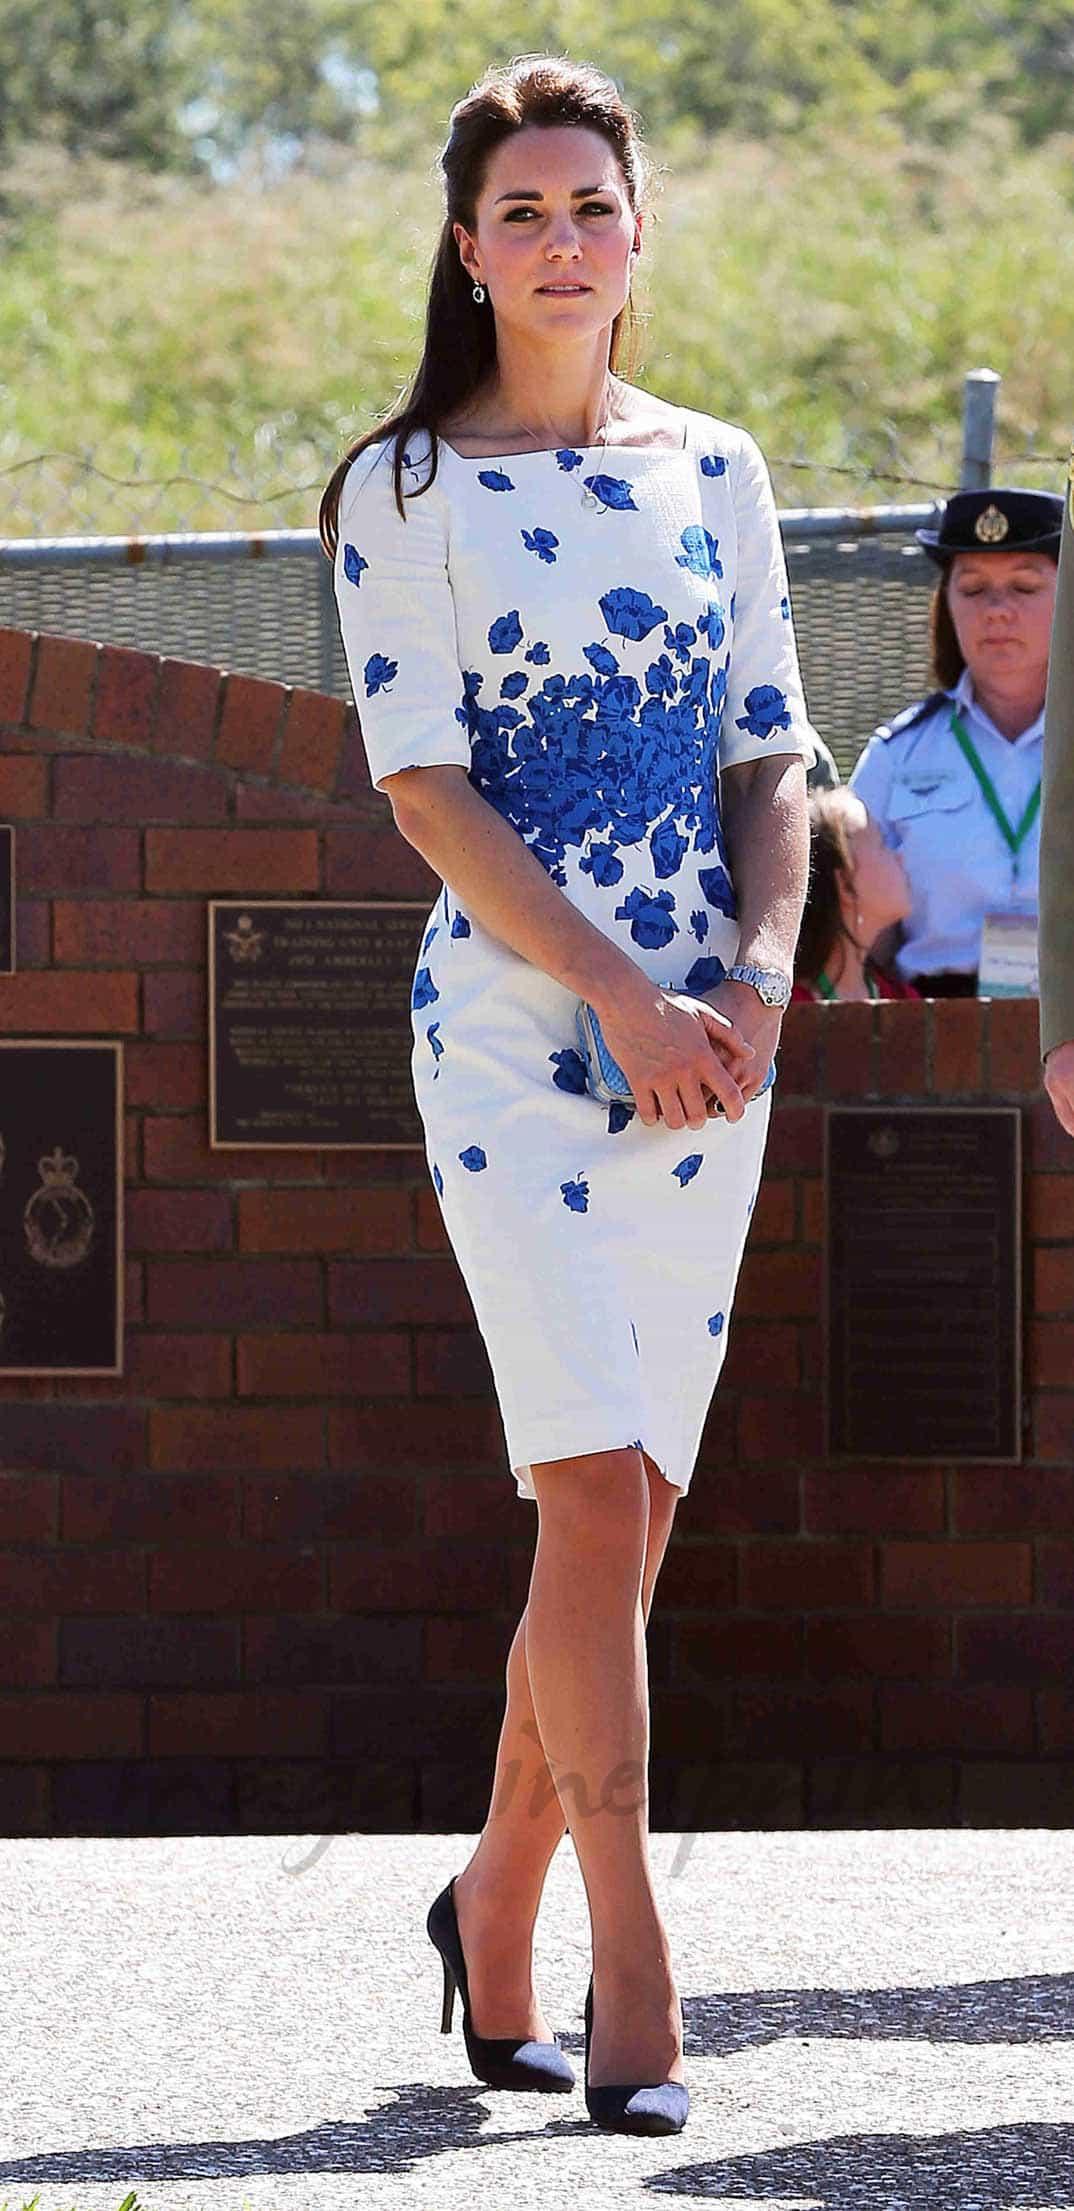 Duquesa de Cambridge, visita a Brisbane, Australia - Abril 2014